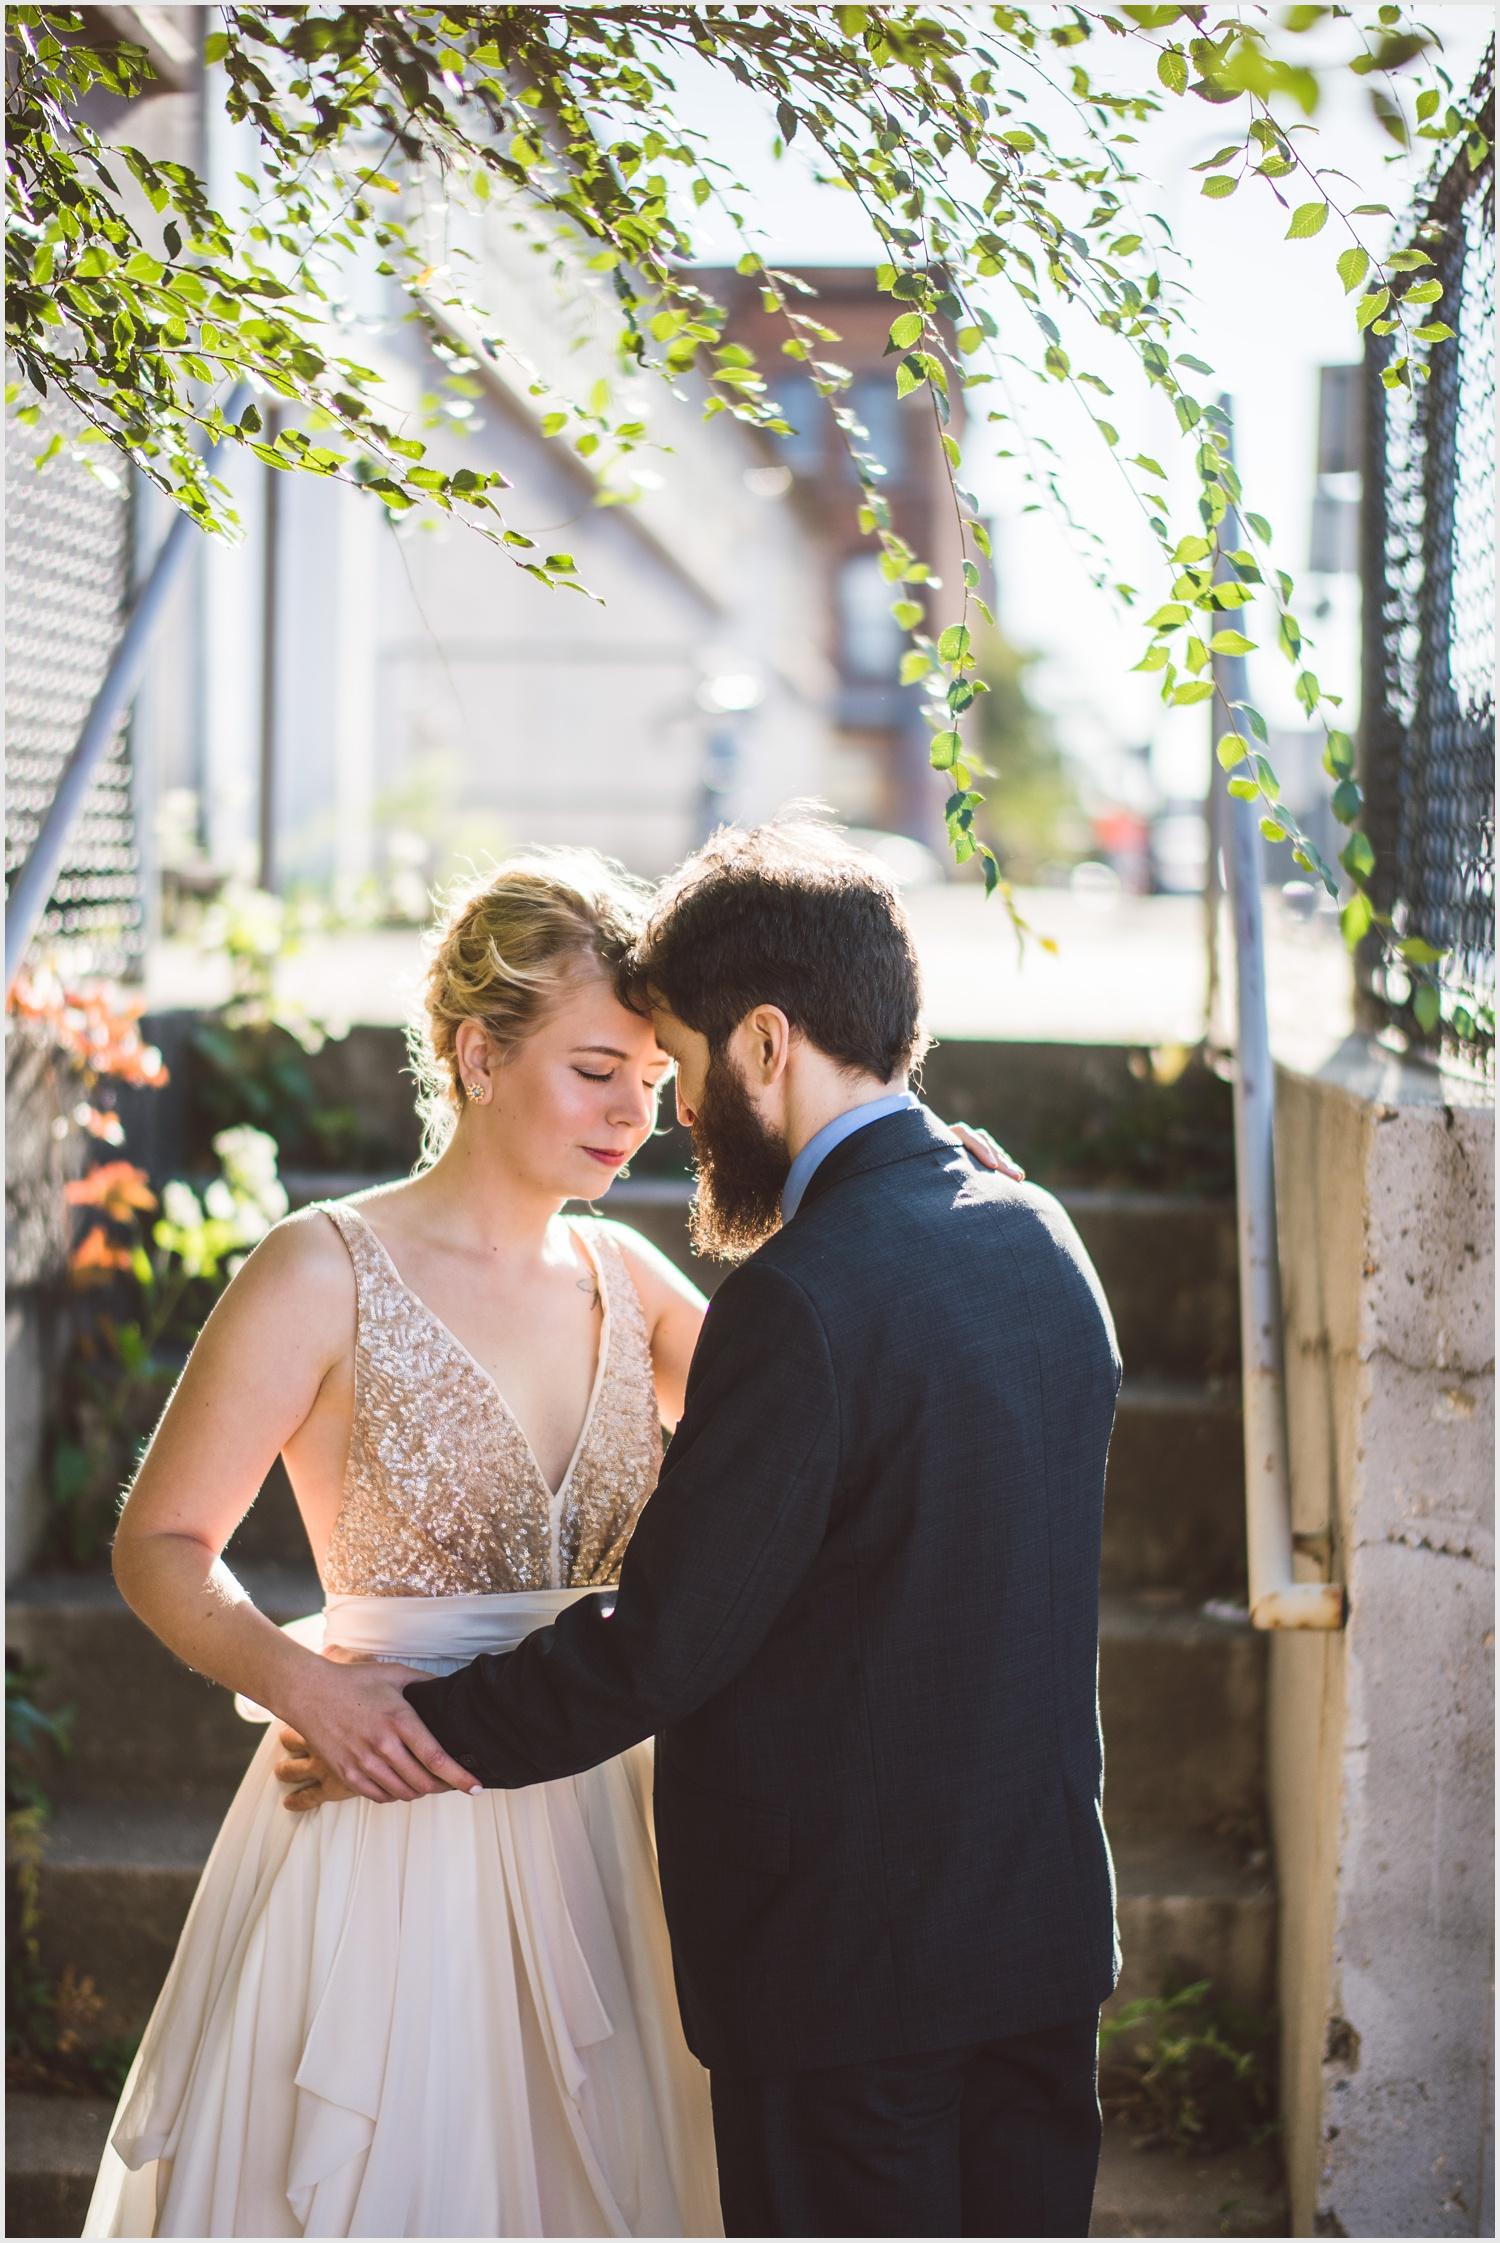 The_Bachelor_Farmer_wedding_North_Loop_Minneapolis_by_lucas_botz_photography_15.jpg